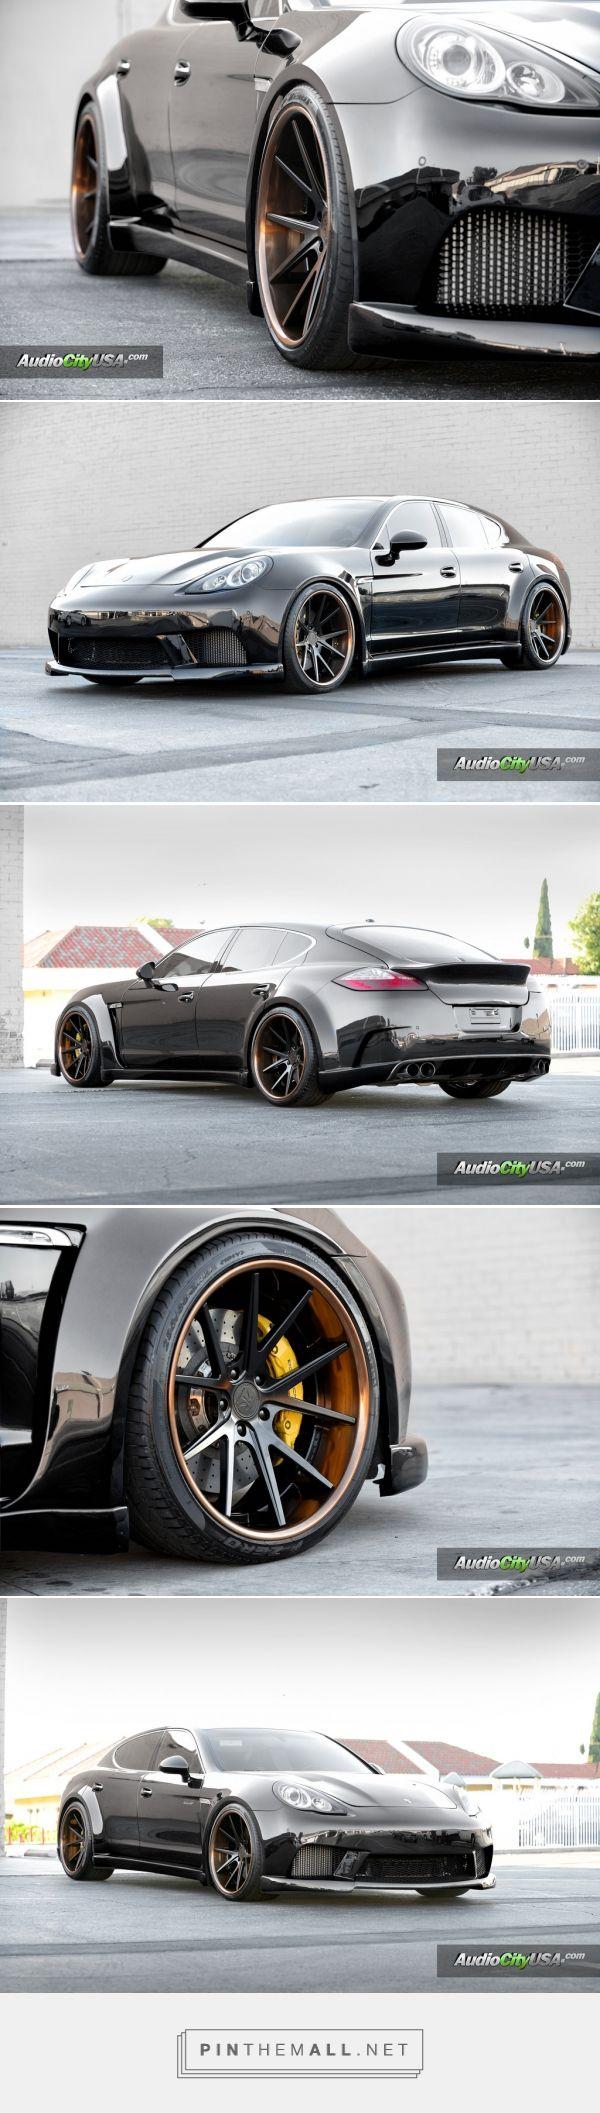 "700 HP Wide Body Porsche Panamera   2015 Sema Build   22"" Rennen Forged R55   AudioCityUsa   Pirelli Tires"